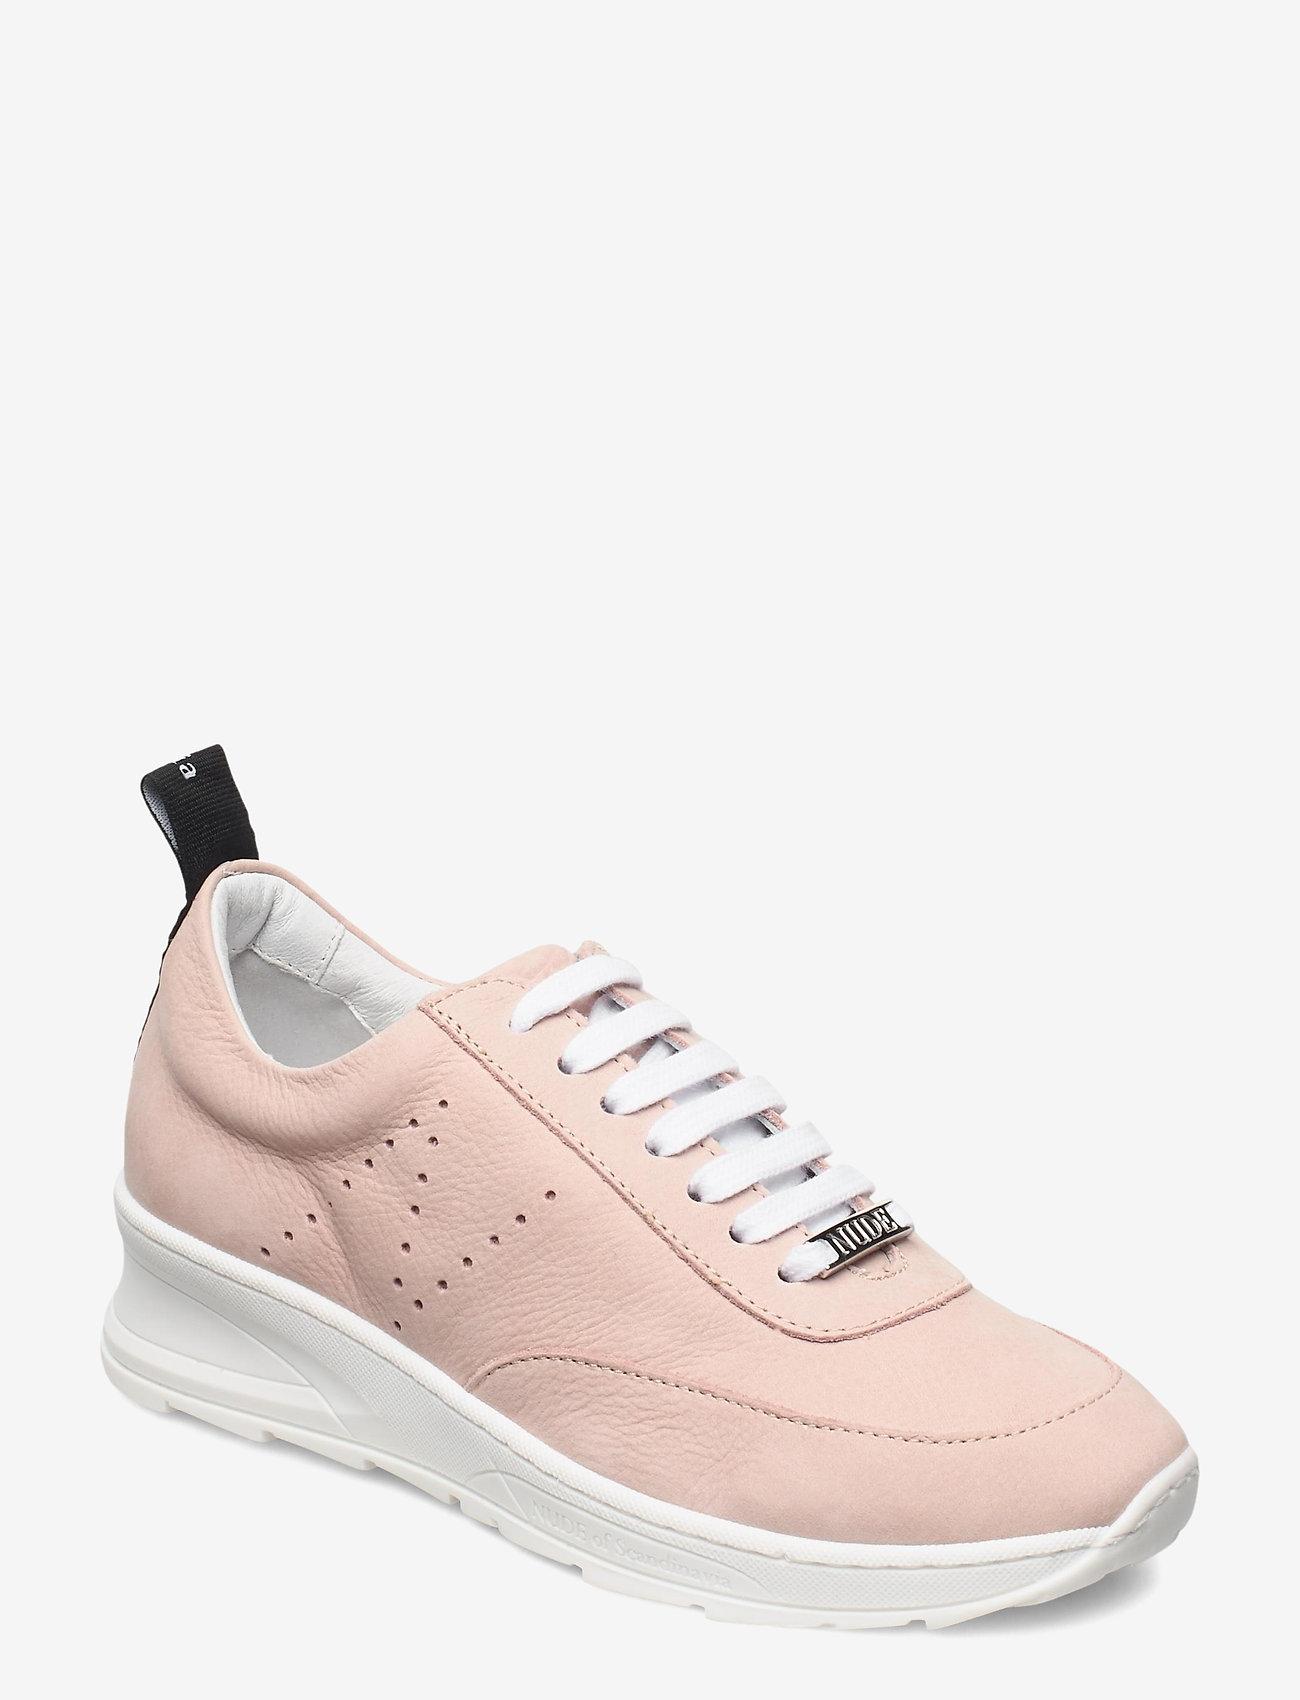 Nude of Scandinavia - PEGGY - låga sneakers - longbeach / silver pink - 0